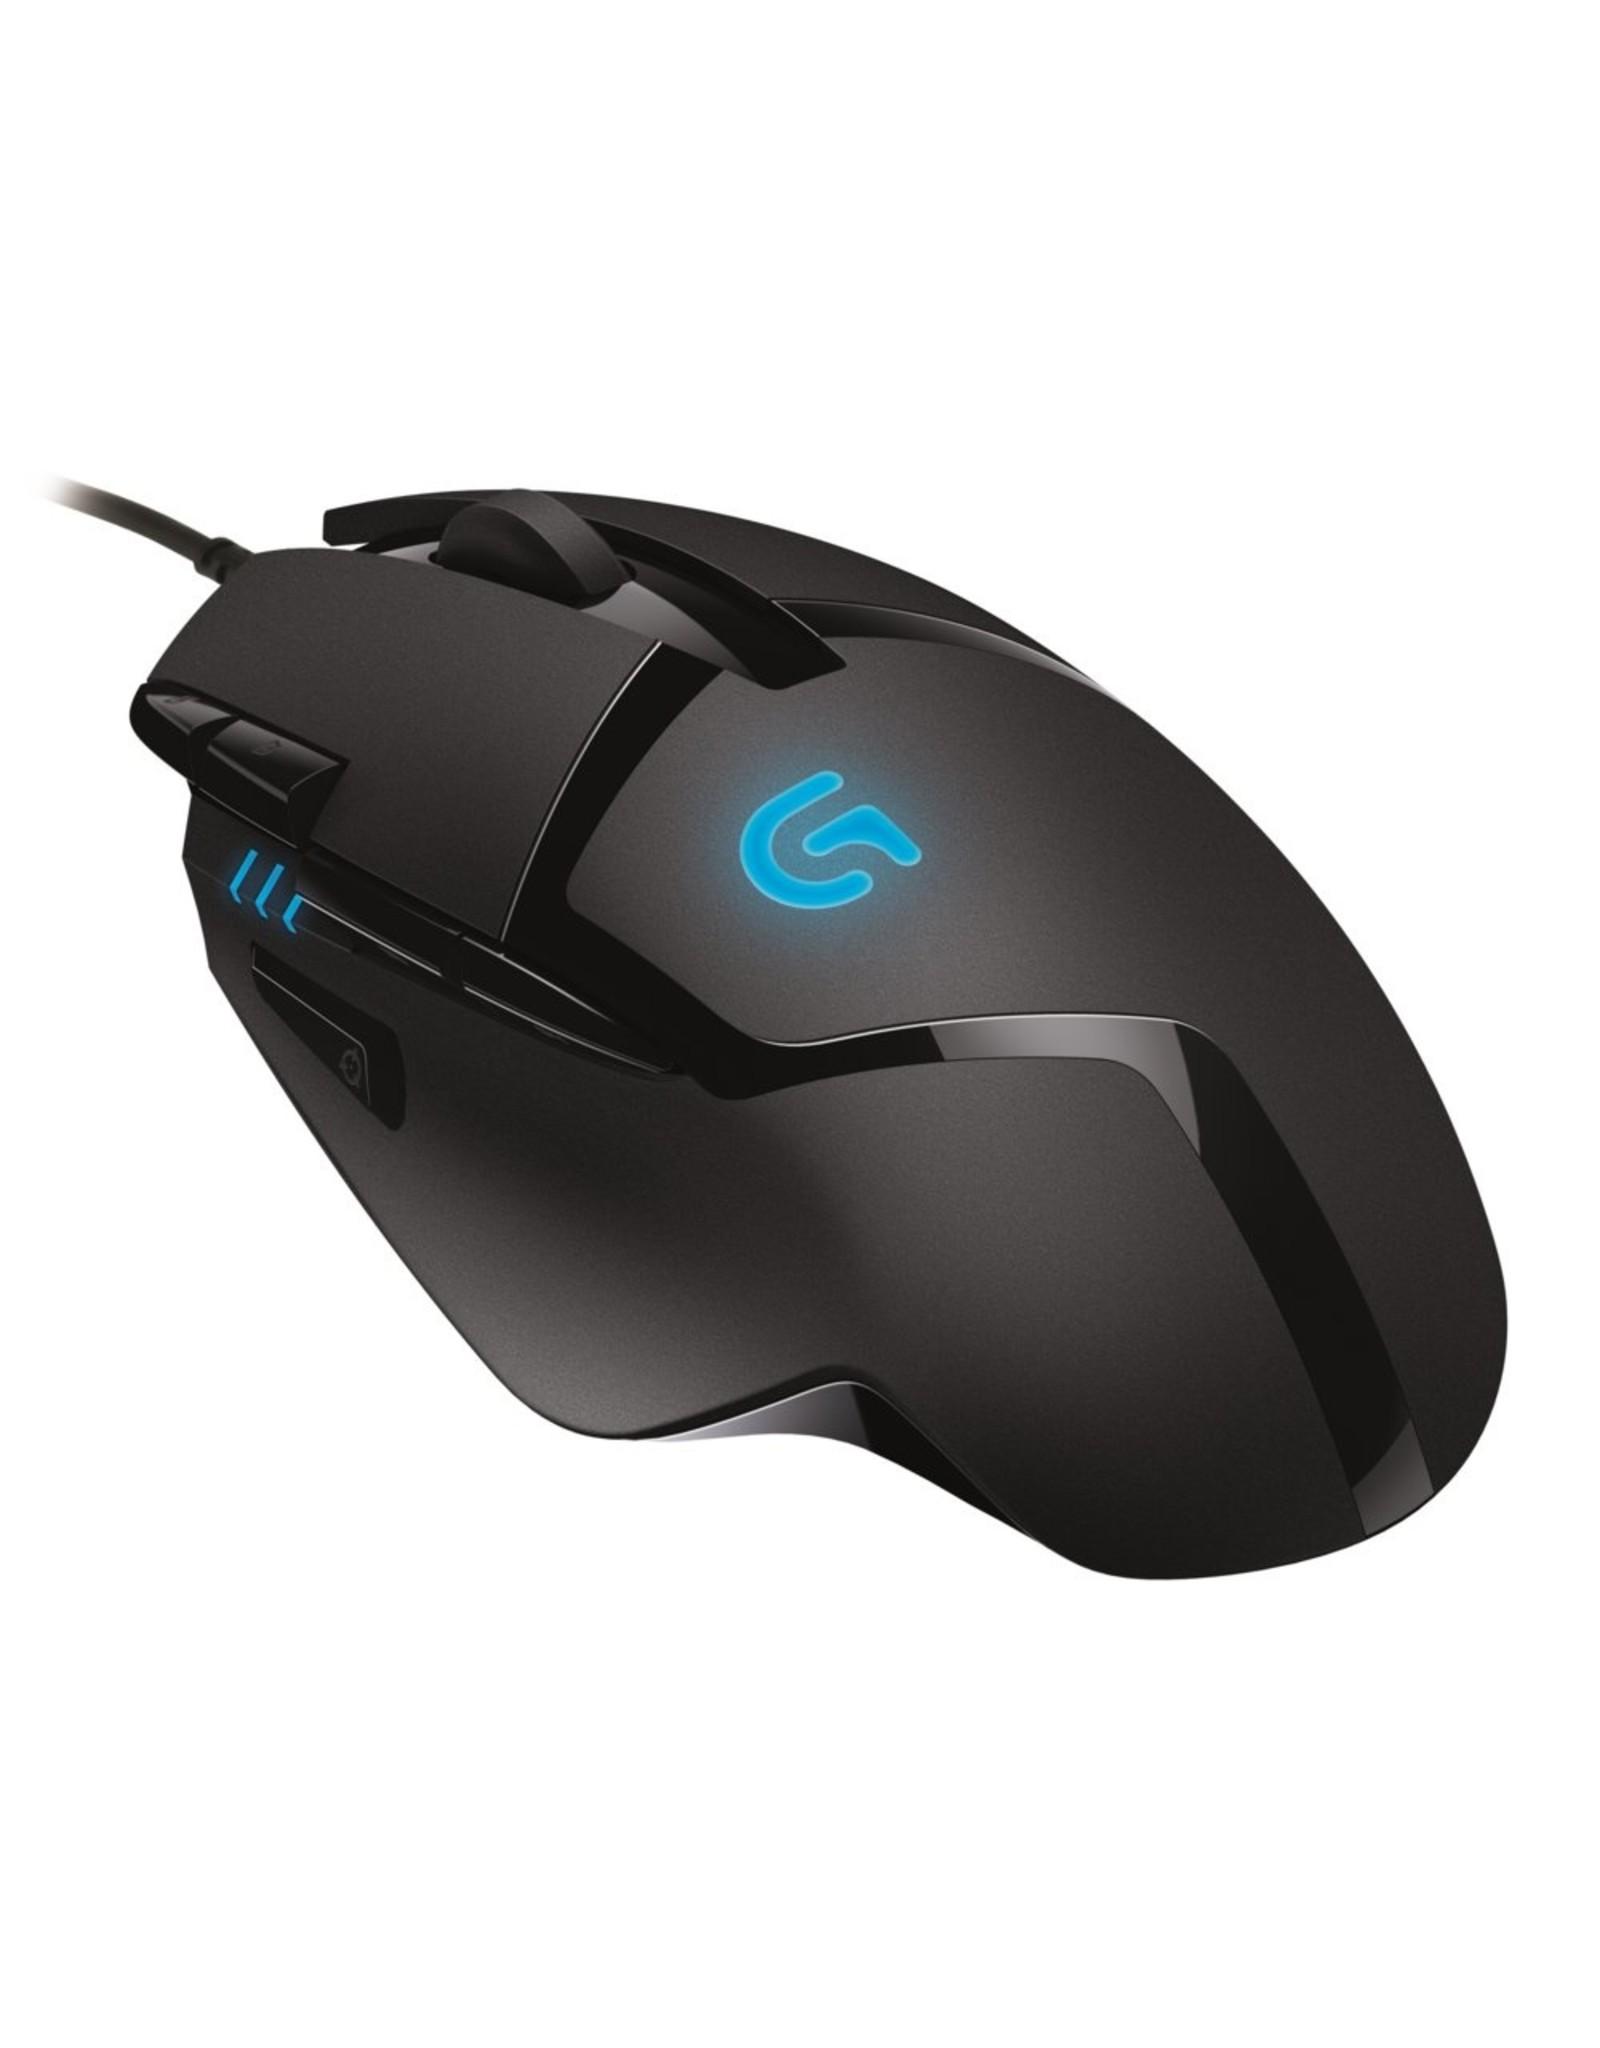 Logitech Gaming Mouse G402 Hyperion Fury RFG (refurbished)